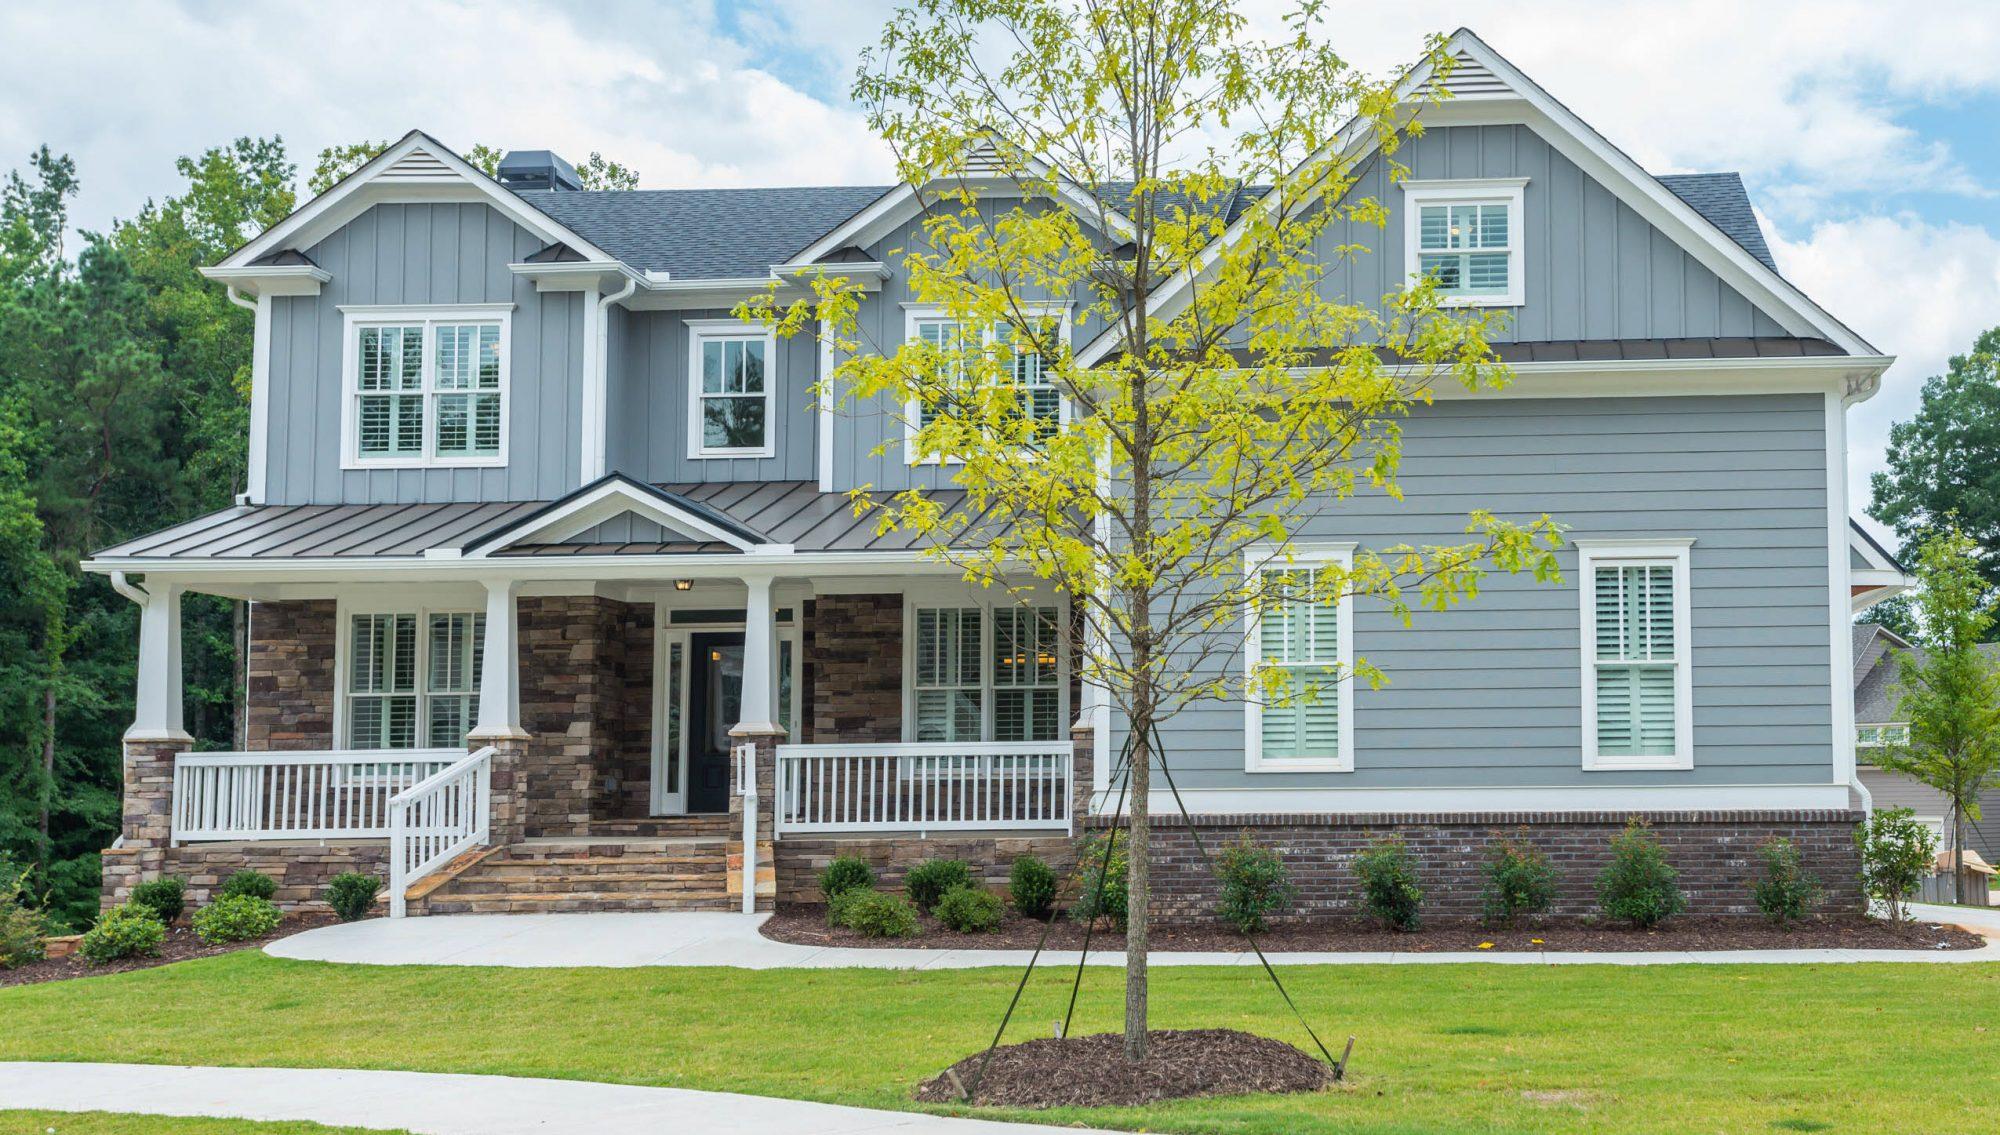 Parsons retreat - 10 new homes in Johns Creek GA by O'Dwyer Homes Atlanta